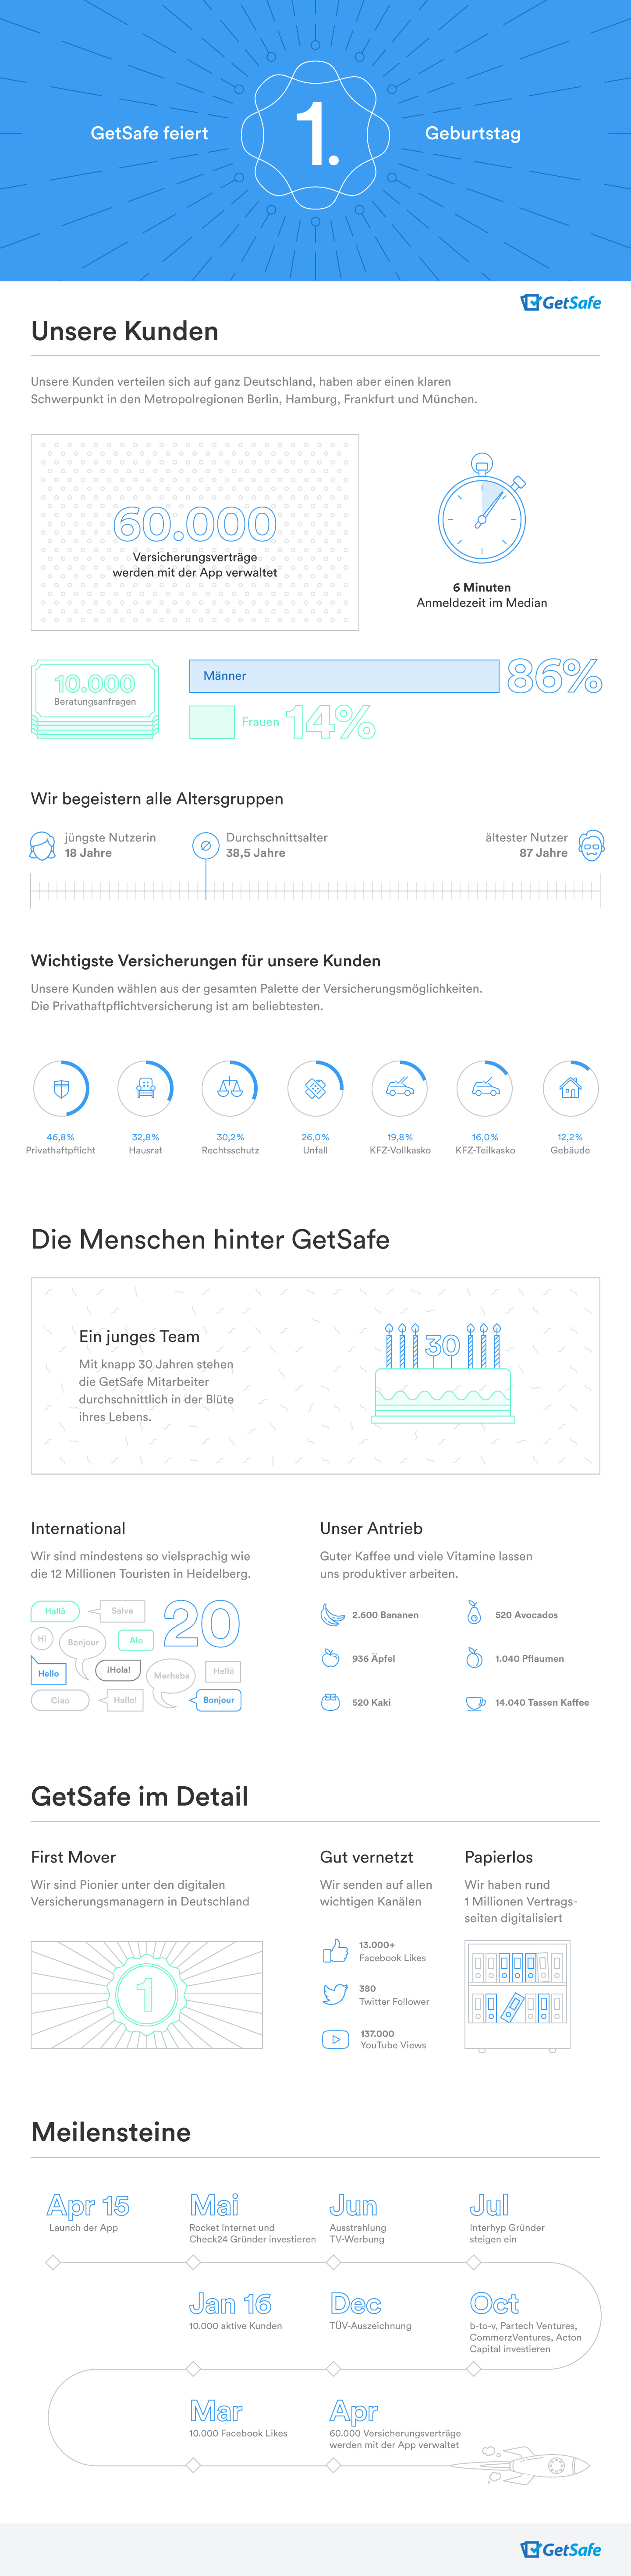 getSafe_infografikJubilaeum_20160420